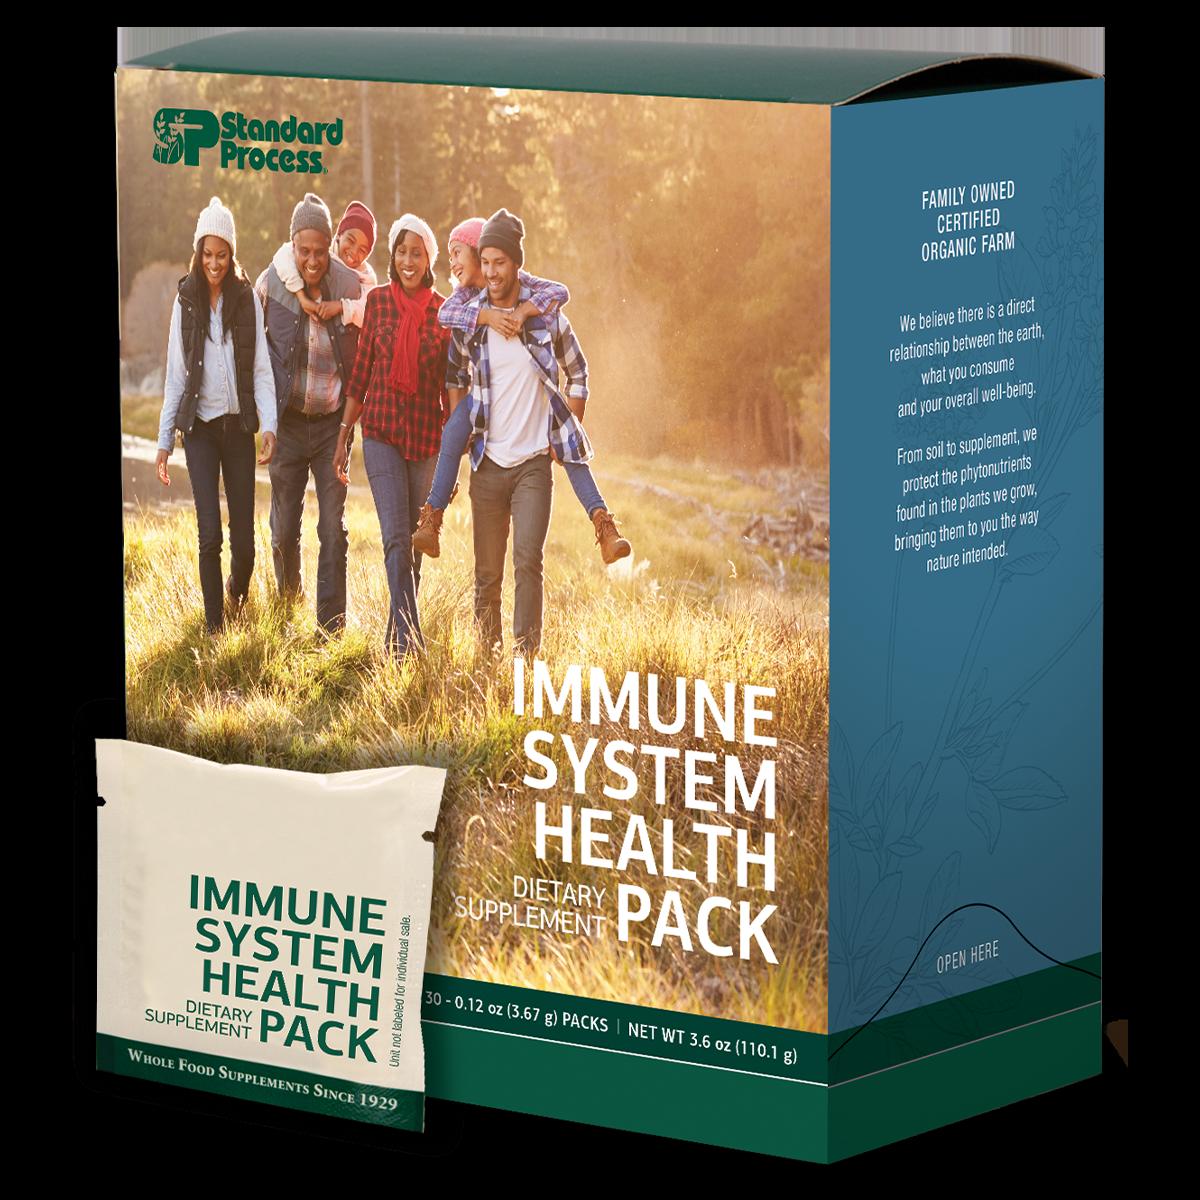 Immune System Health Pack